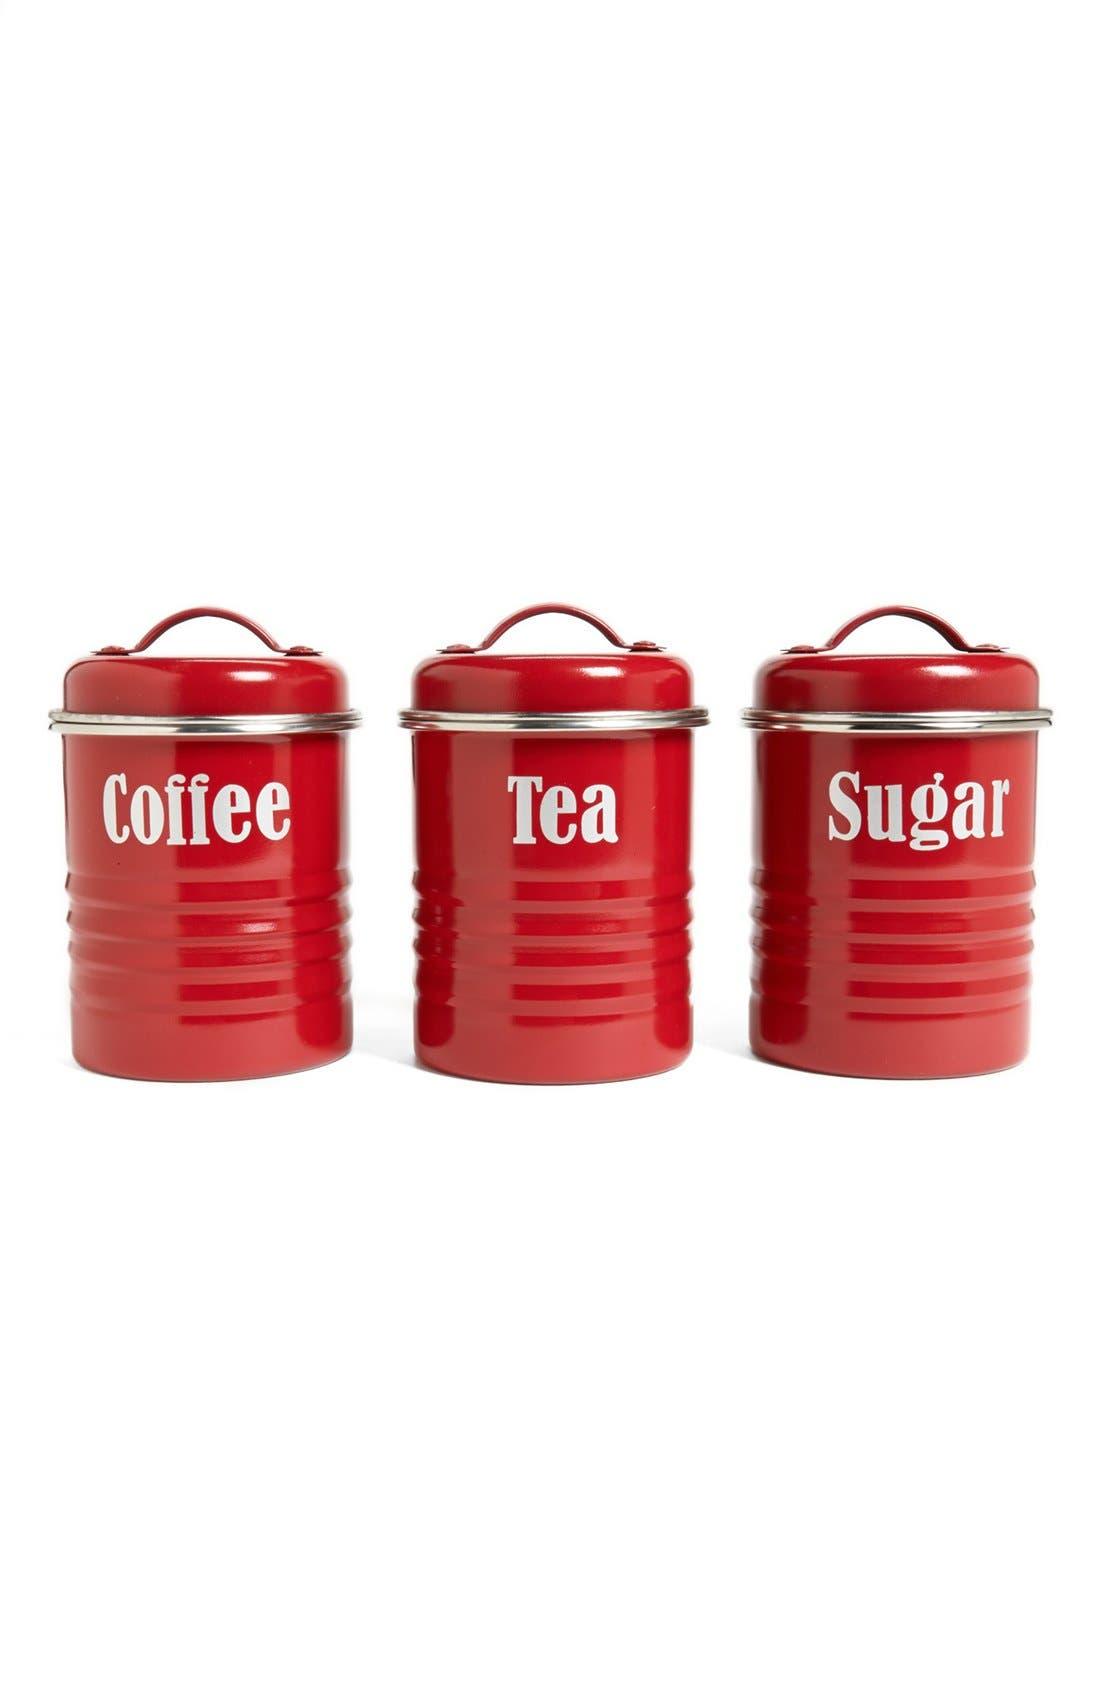 Main Image - Typhoon 'Vintage Kitchen' Enameled Tea, Coffee & Sugar Storage Canisters (Set of 3)